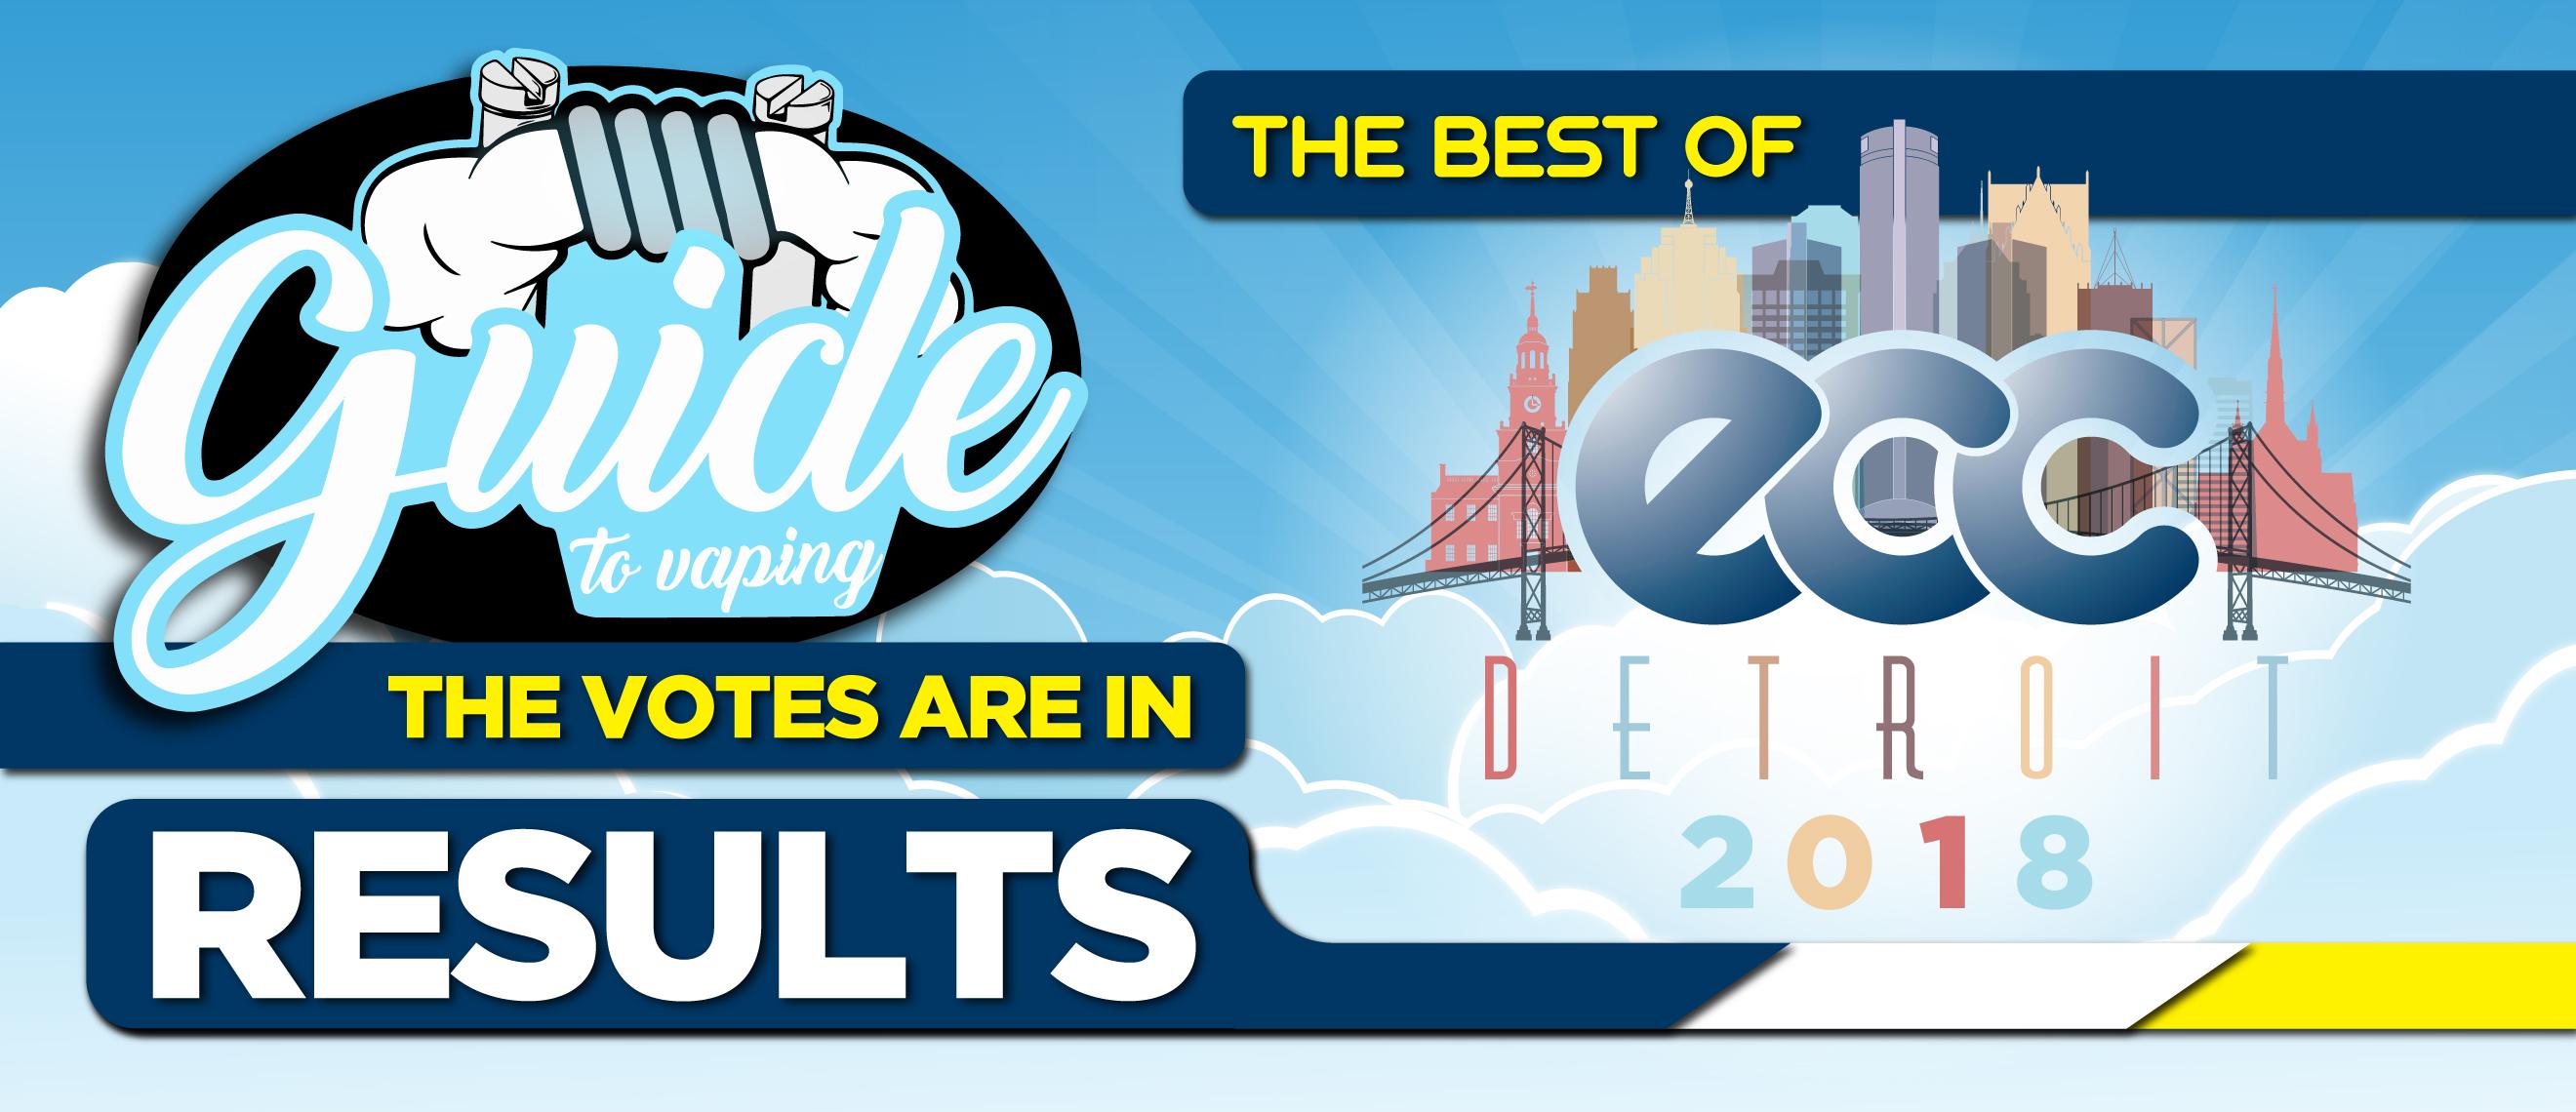 The Best of ECC Detroit 2018 Results